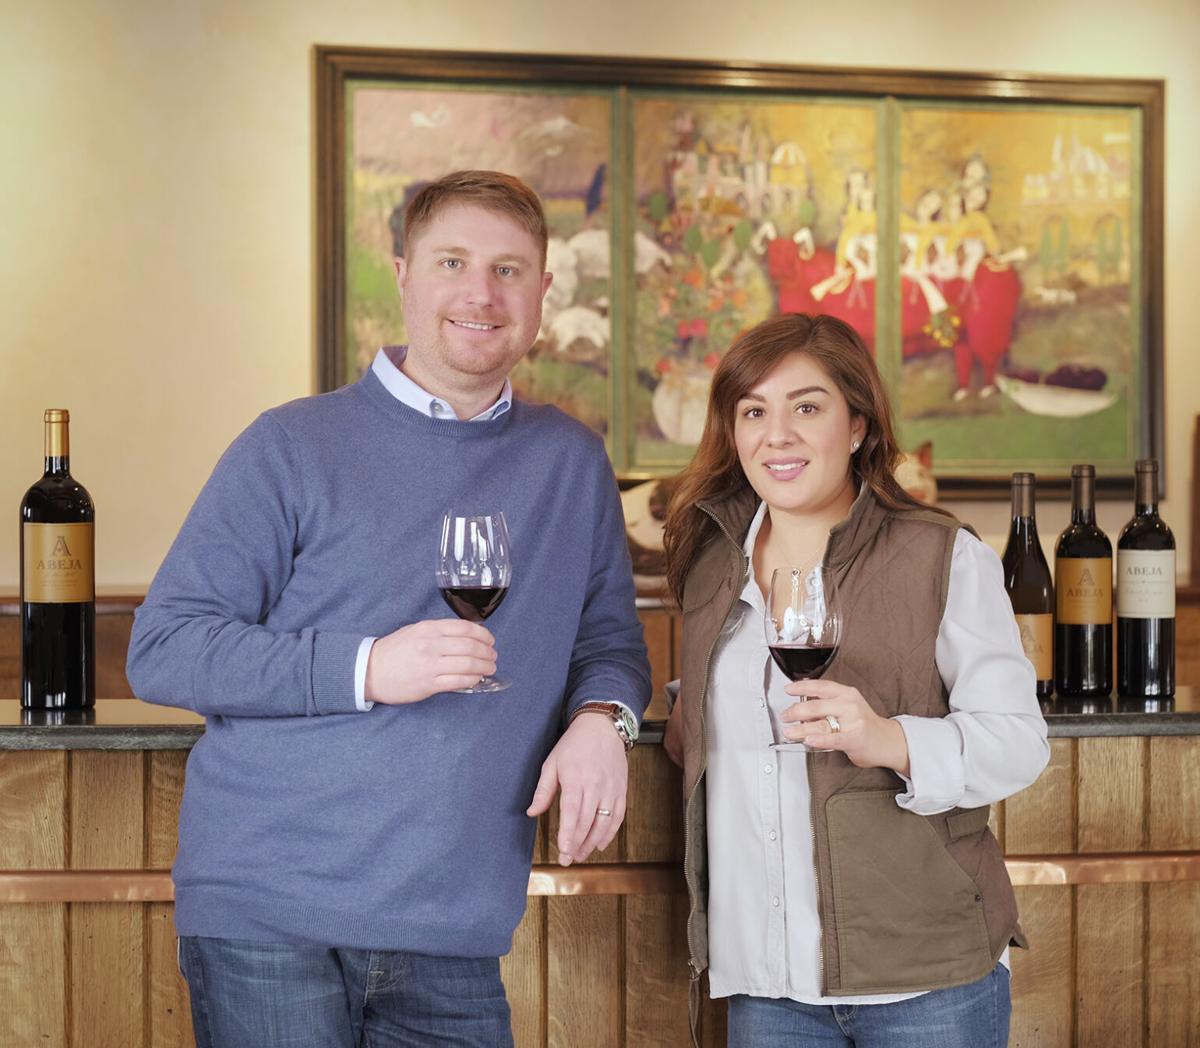 HST Winemakers-Daniel_Wampfler_Amy_Alvarez-Wampfler-Abeja.jpg